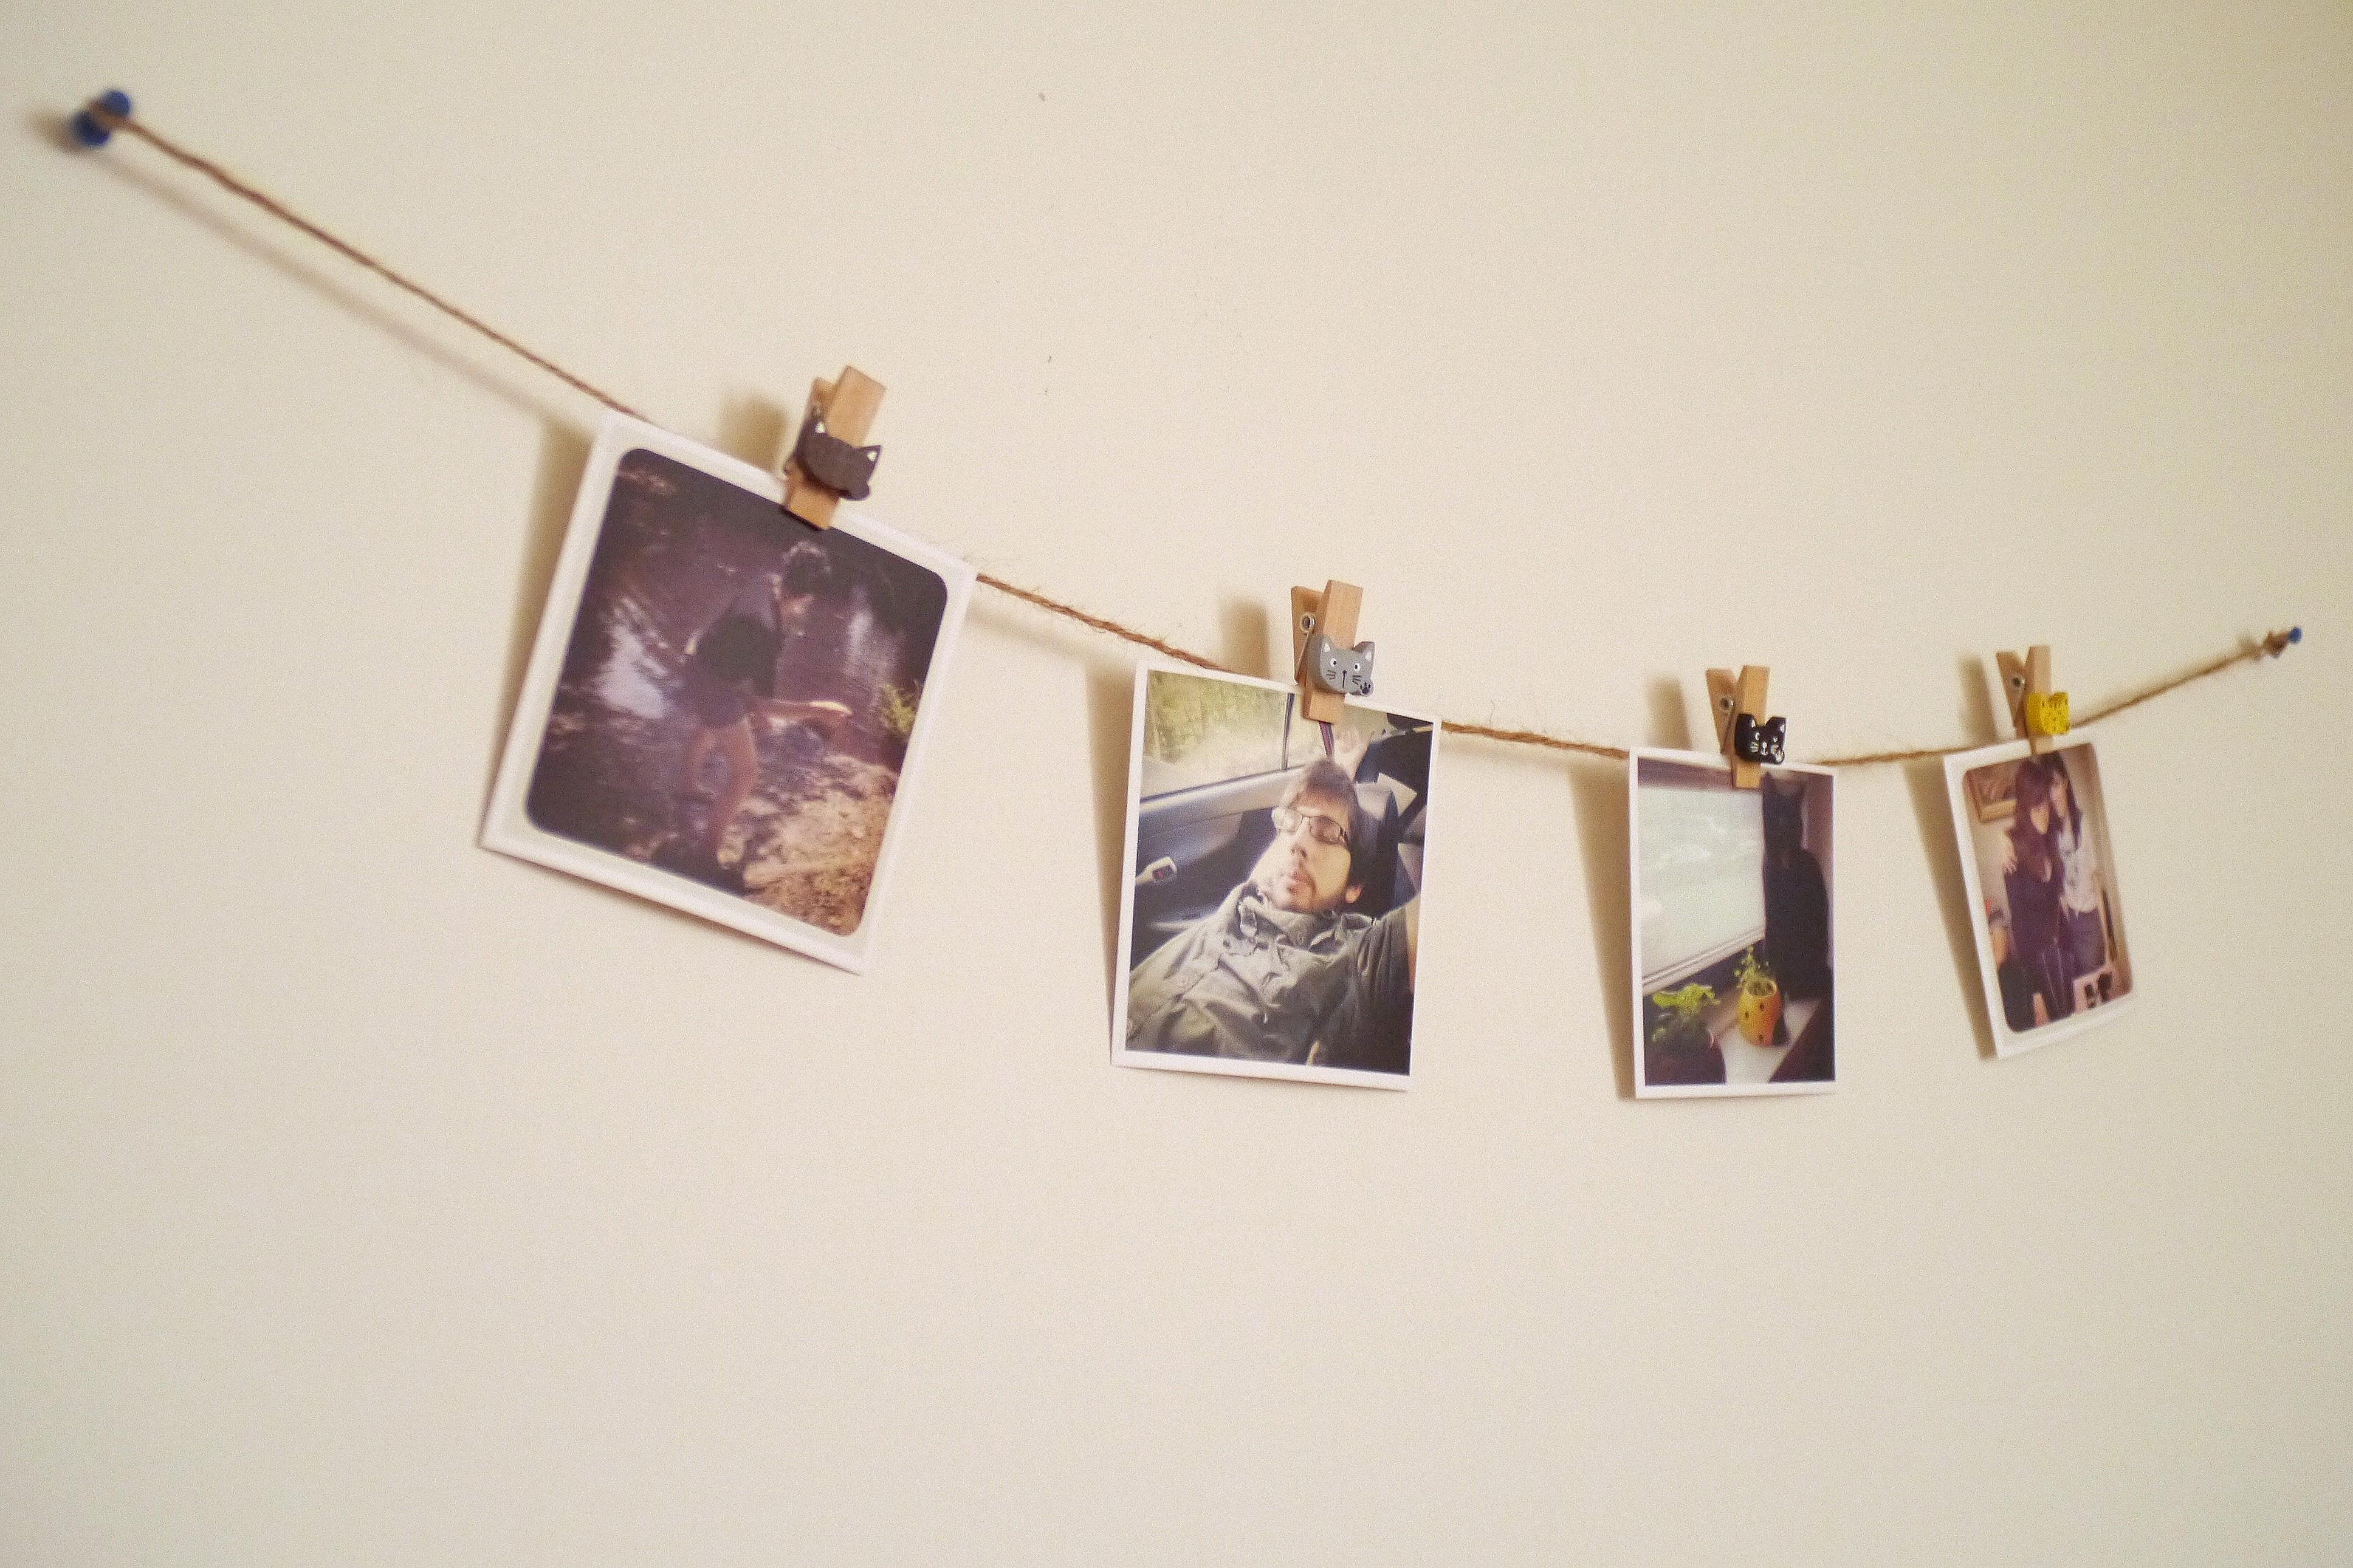 Easy DIY Polaroid Bunting – Custom Photo Garlands Tutorial | Bee's ...: beesbeautifulworld.com/2014/04/20/easy-diy-polaroid-bunting-custom...